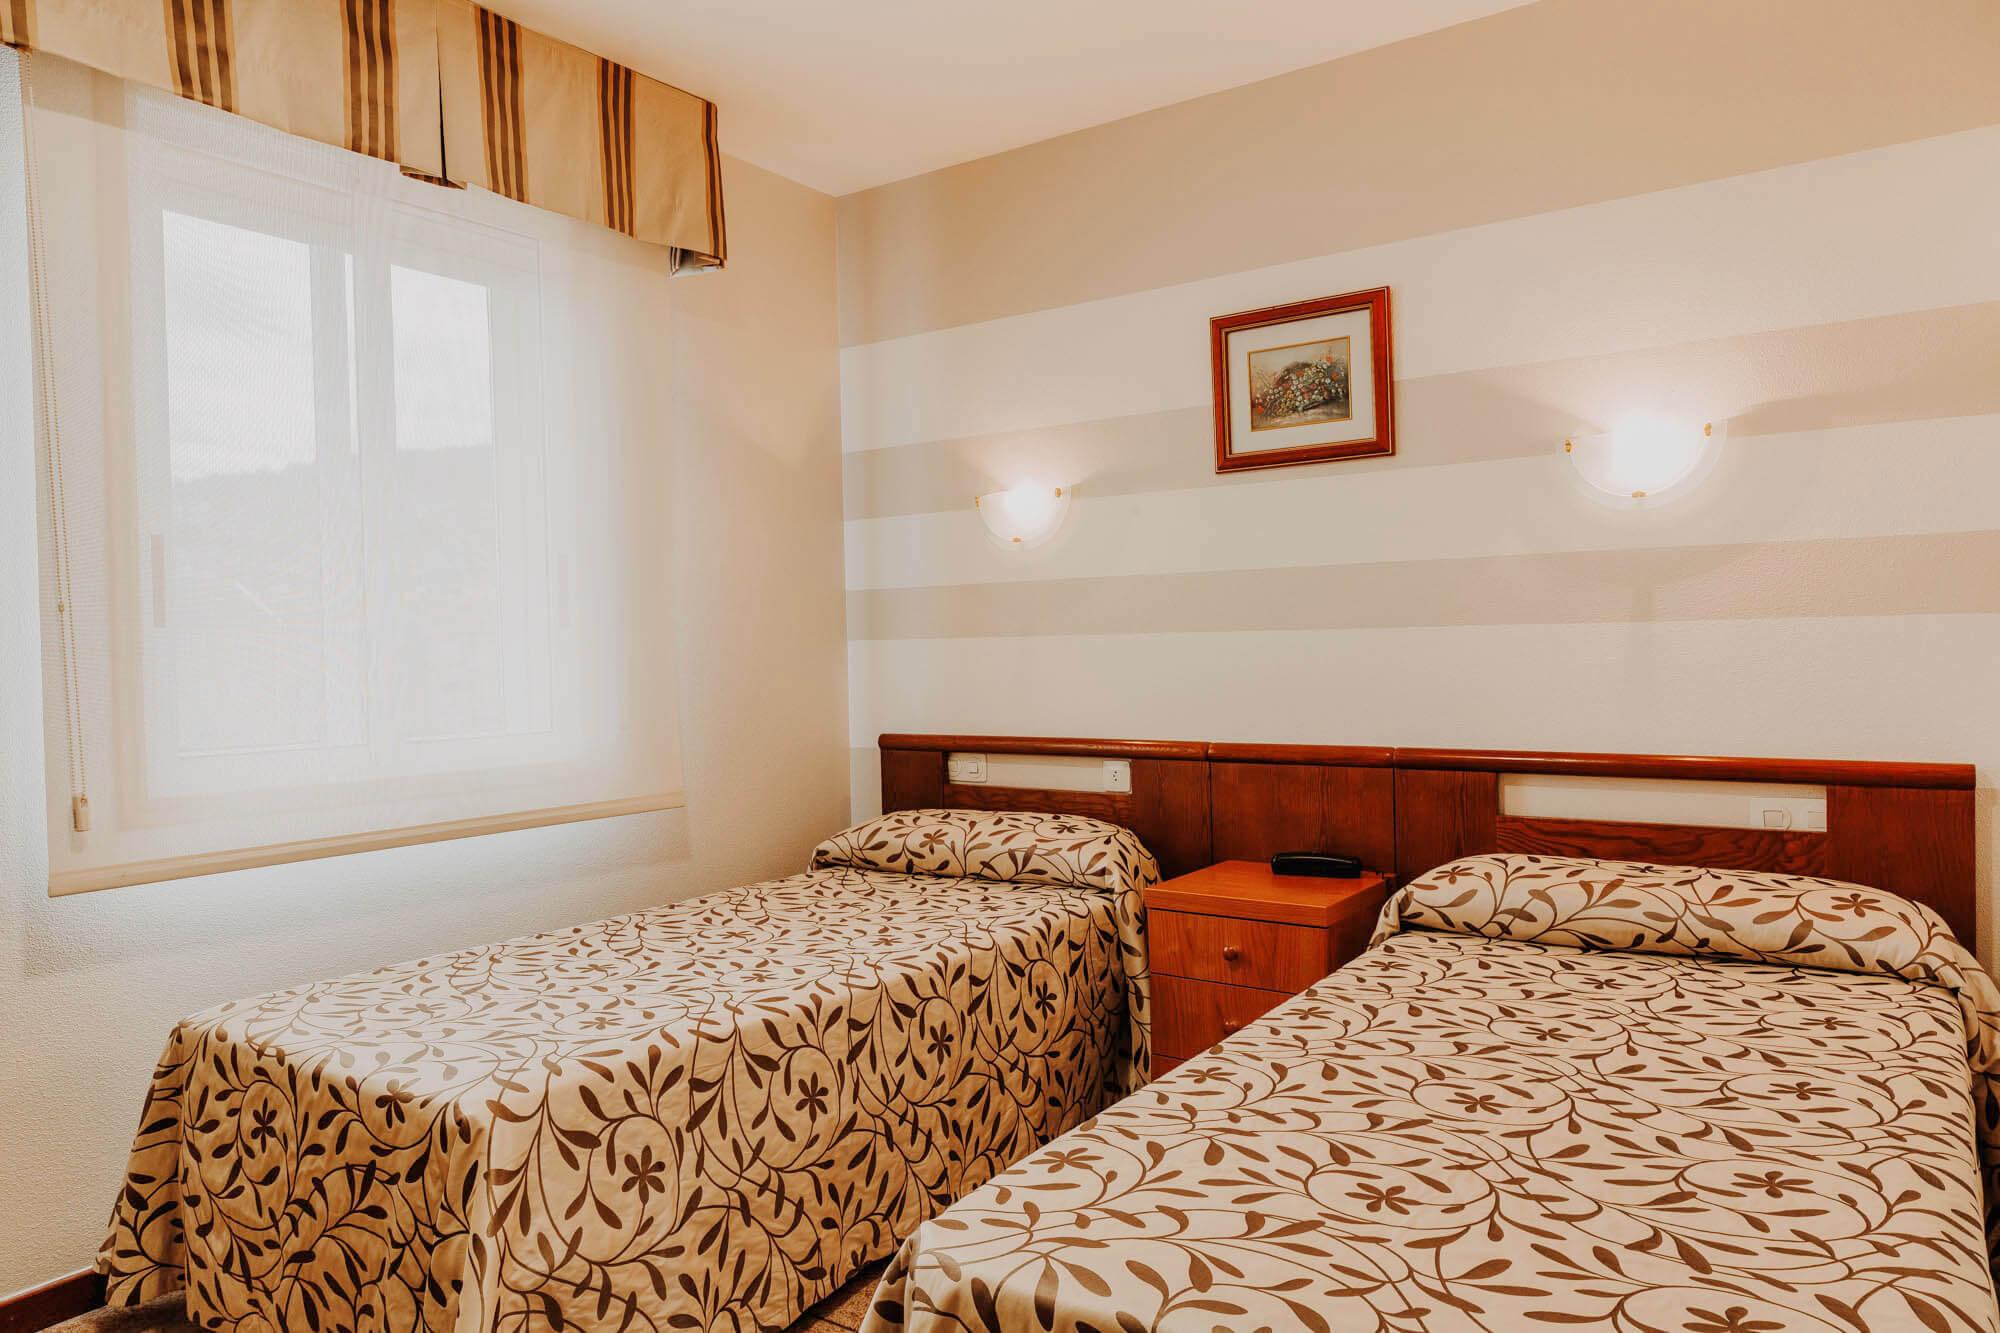 hotelincamardoble 4